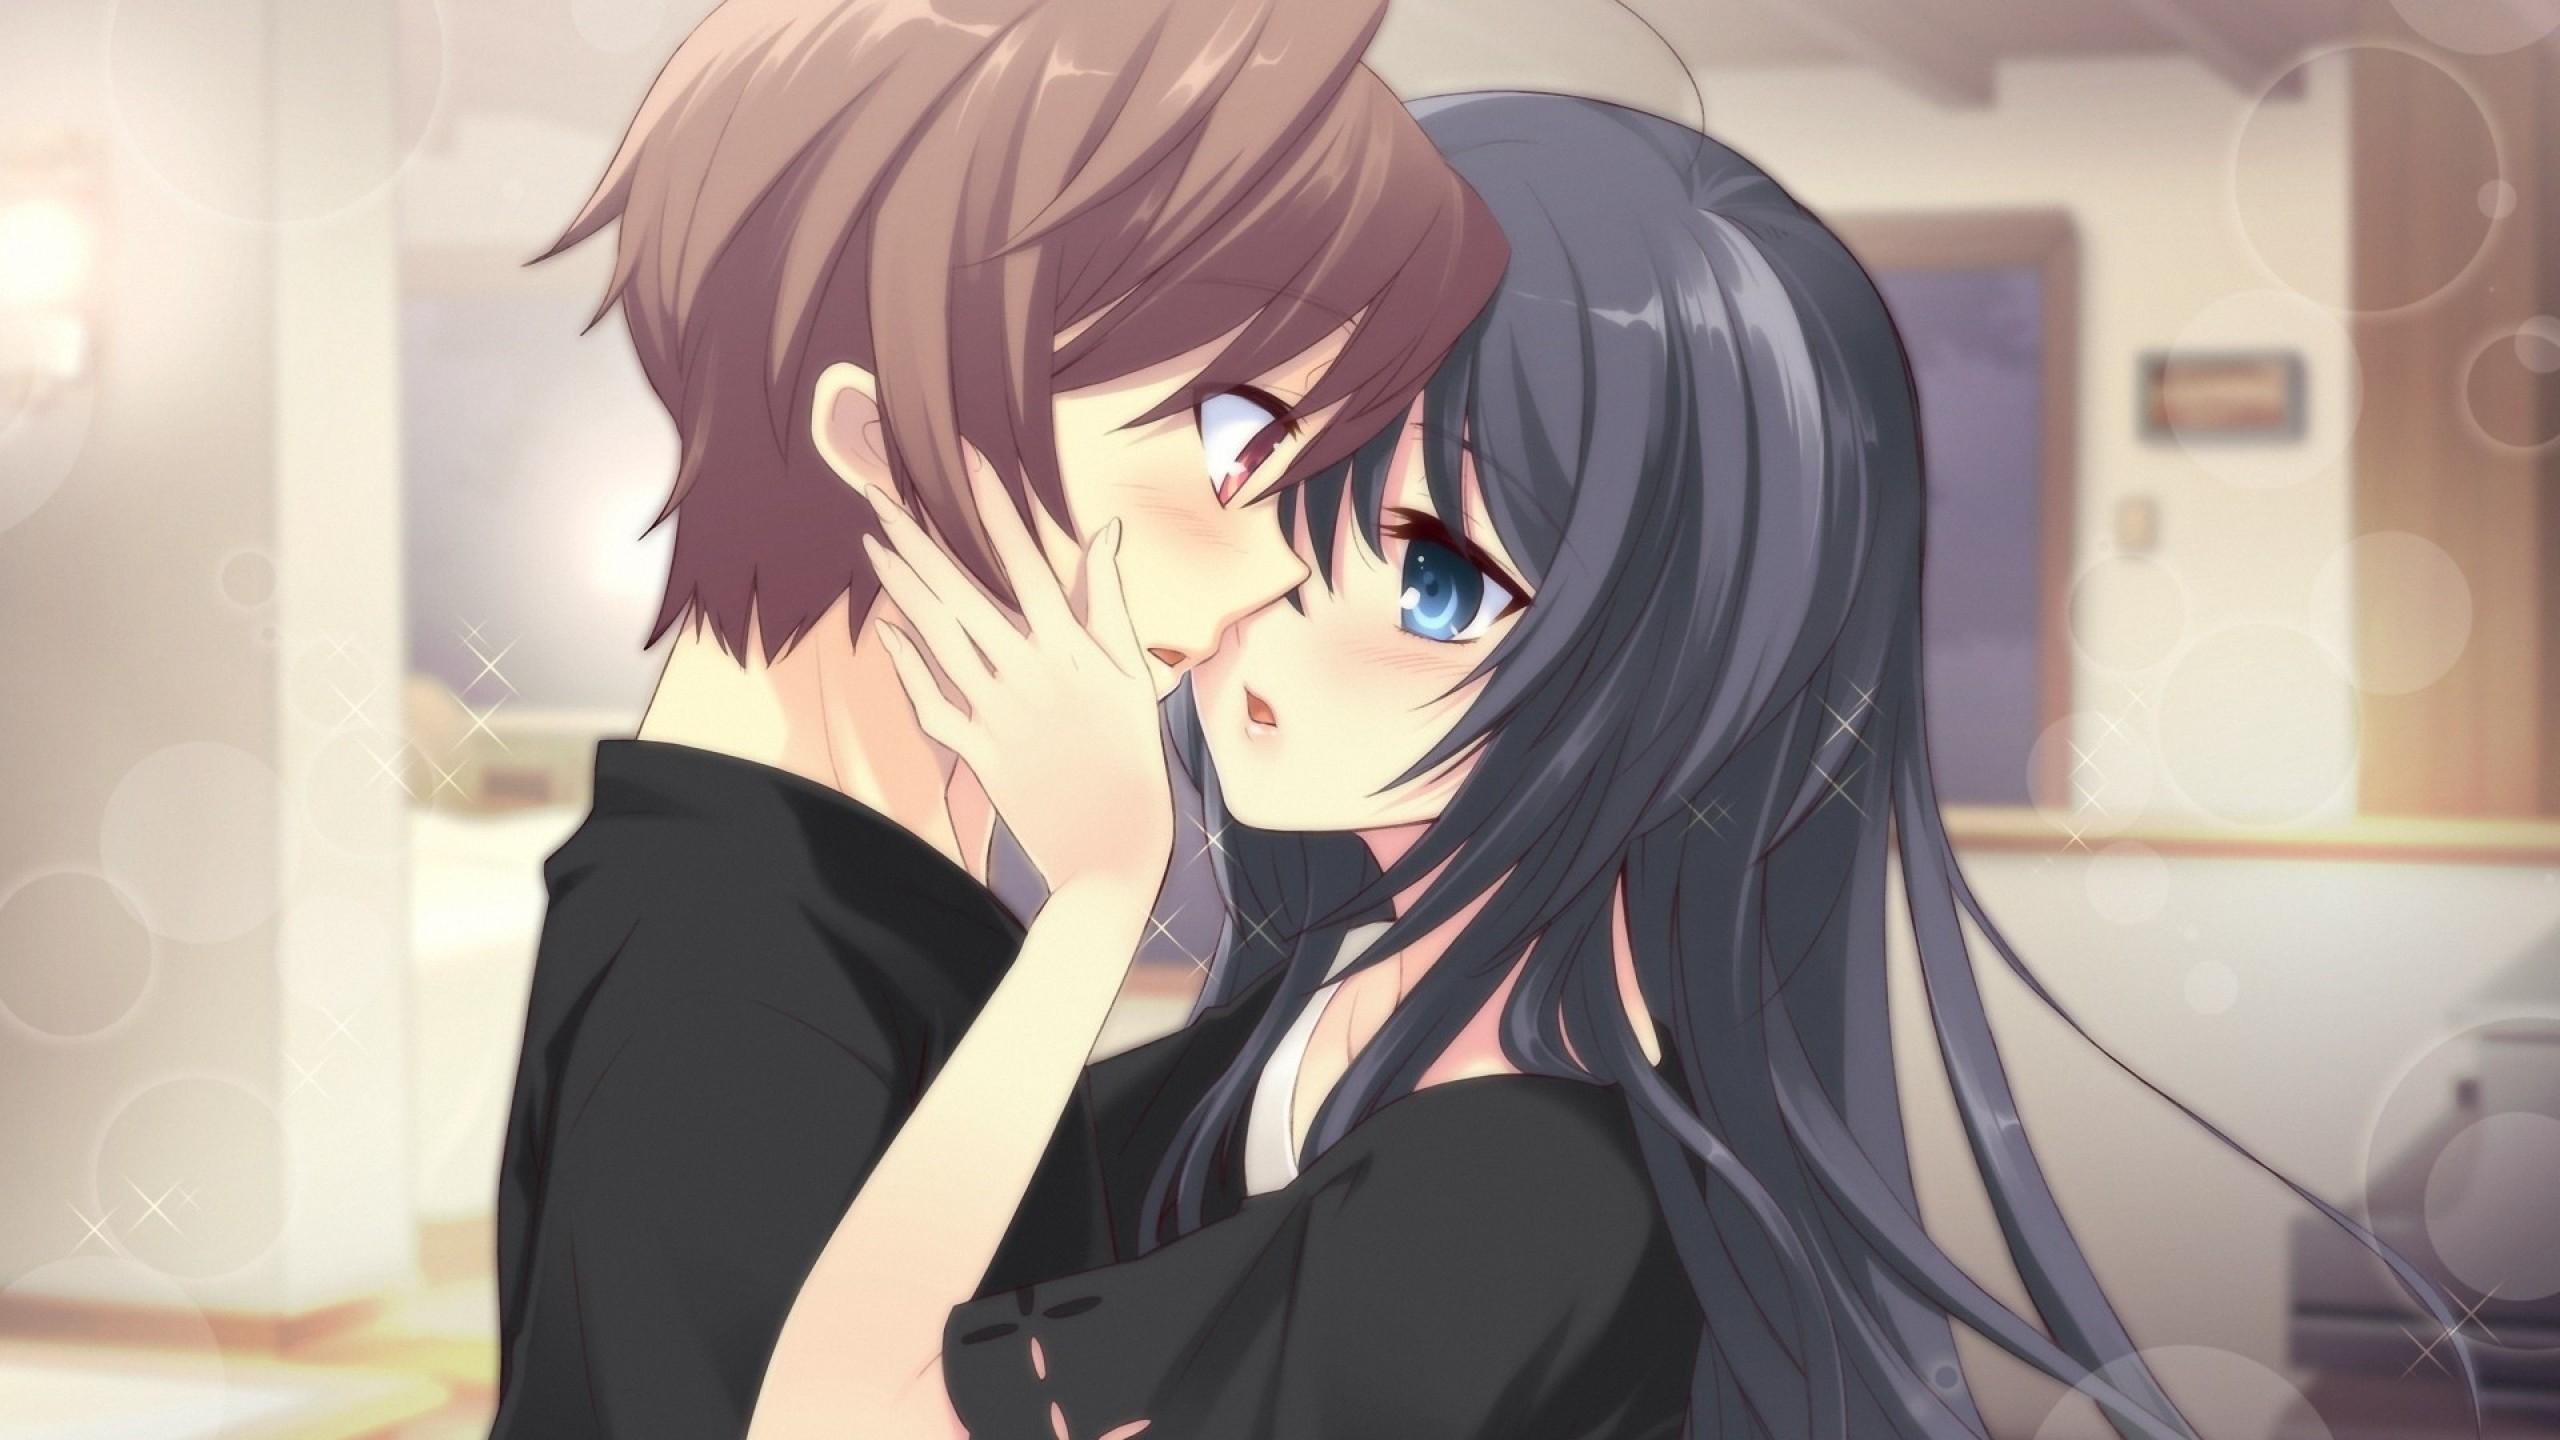 images?q=tbn:ANd9GcQh_l3eQ5xwiPy07kGEXjmjgmBKBRB7H2mRxCGhv1tFWg5c_mWT Ideas For Anime Art Boy And Girl Love @koolgadgetz.com.info